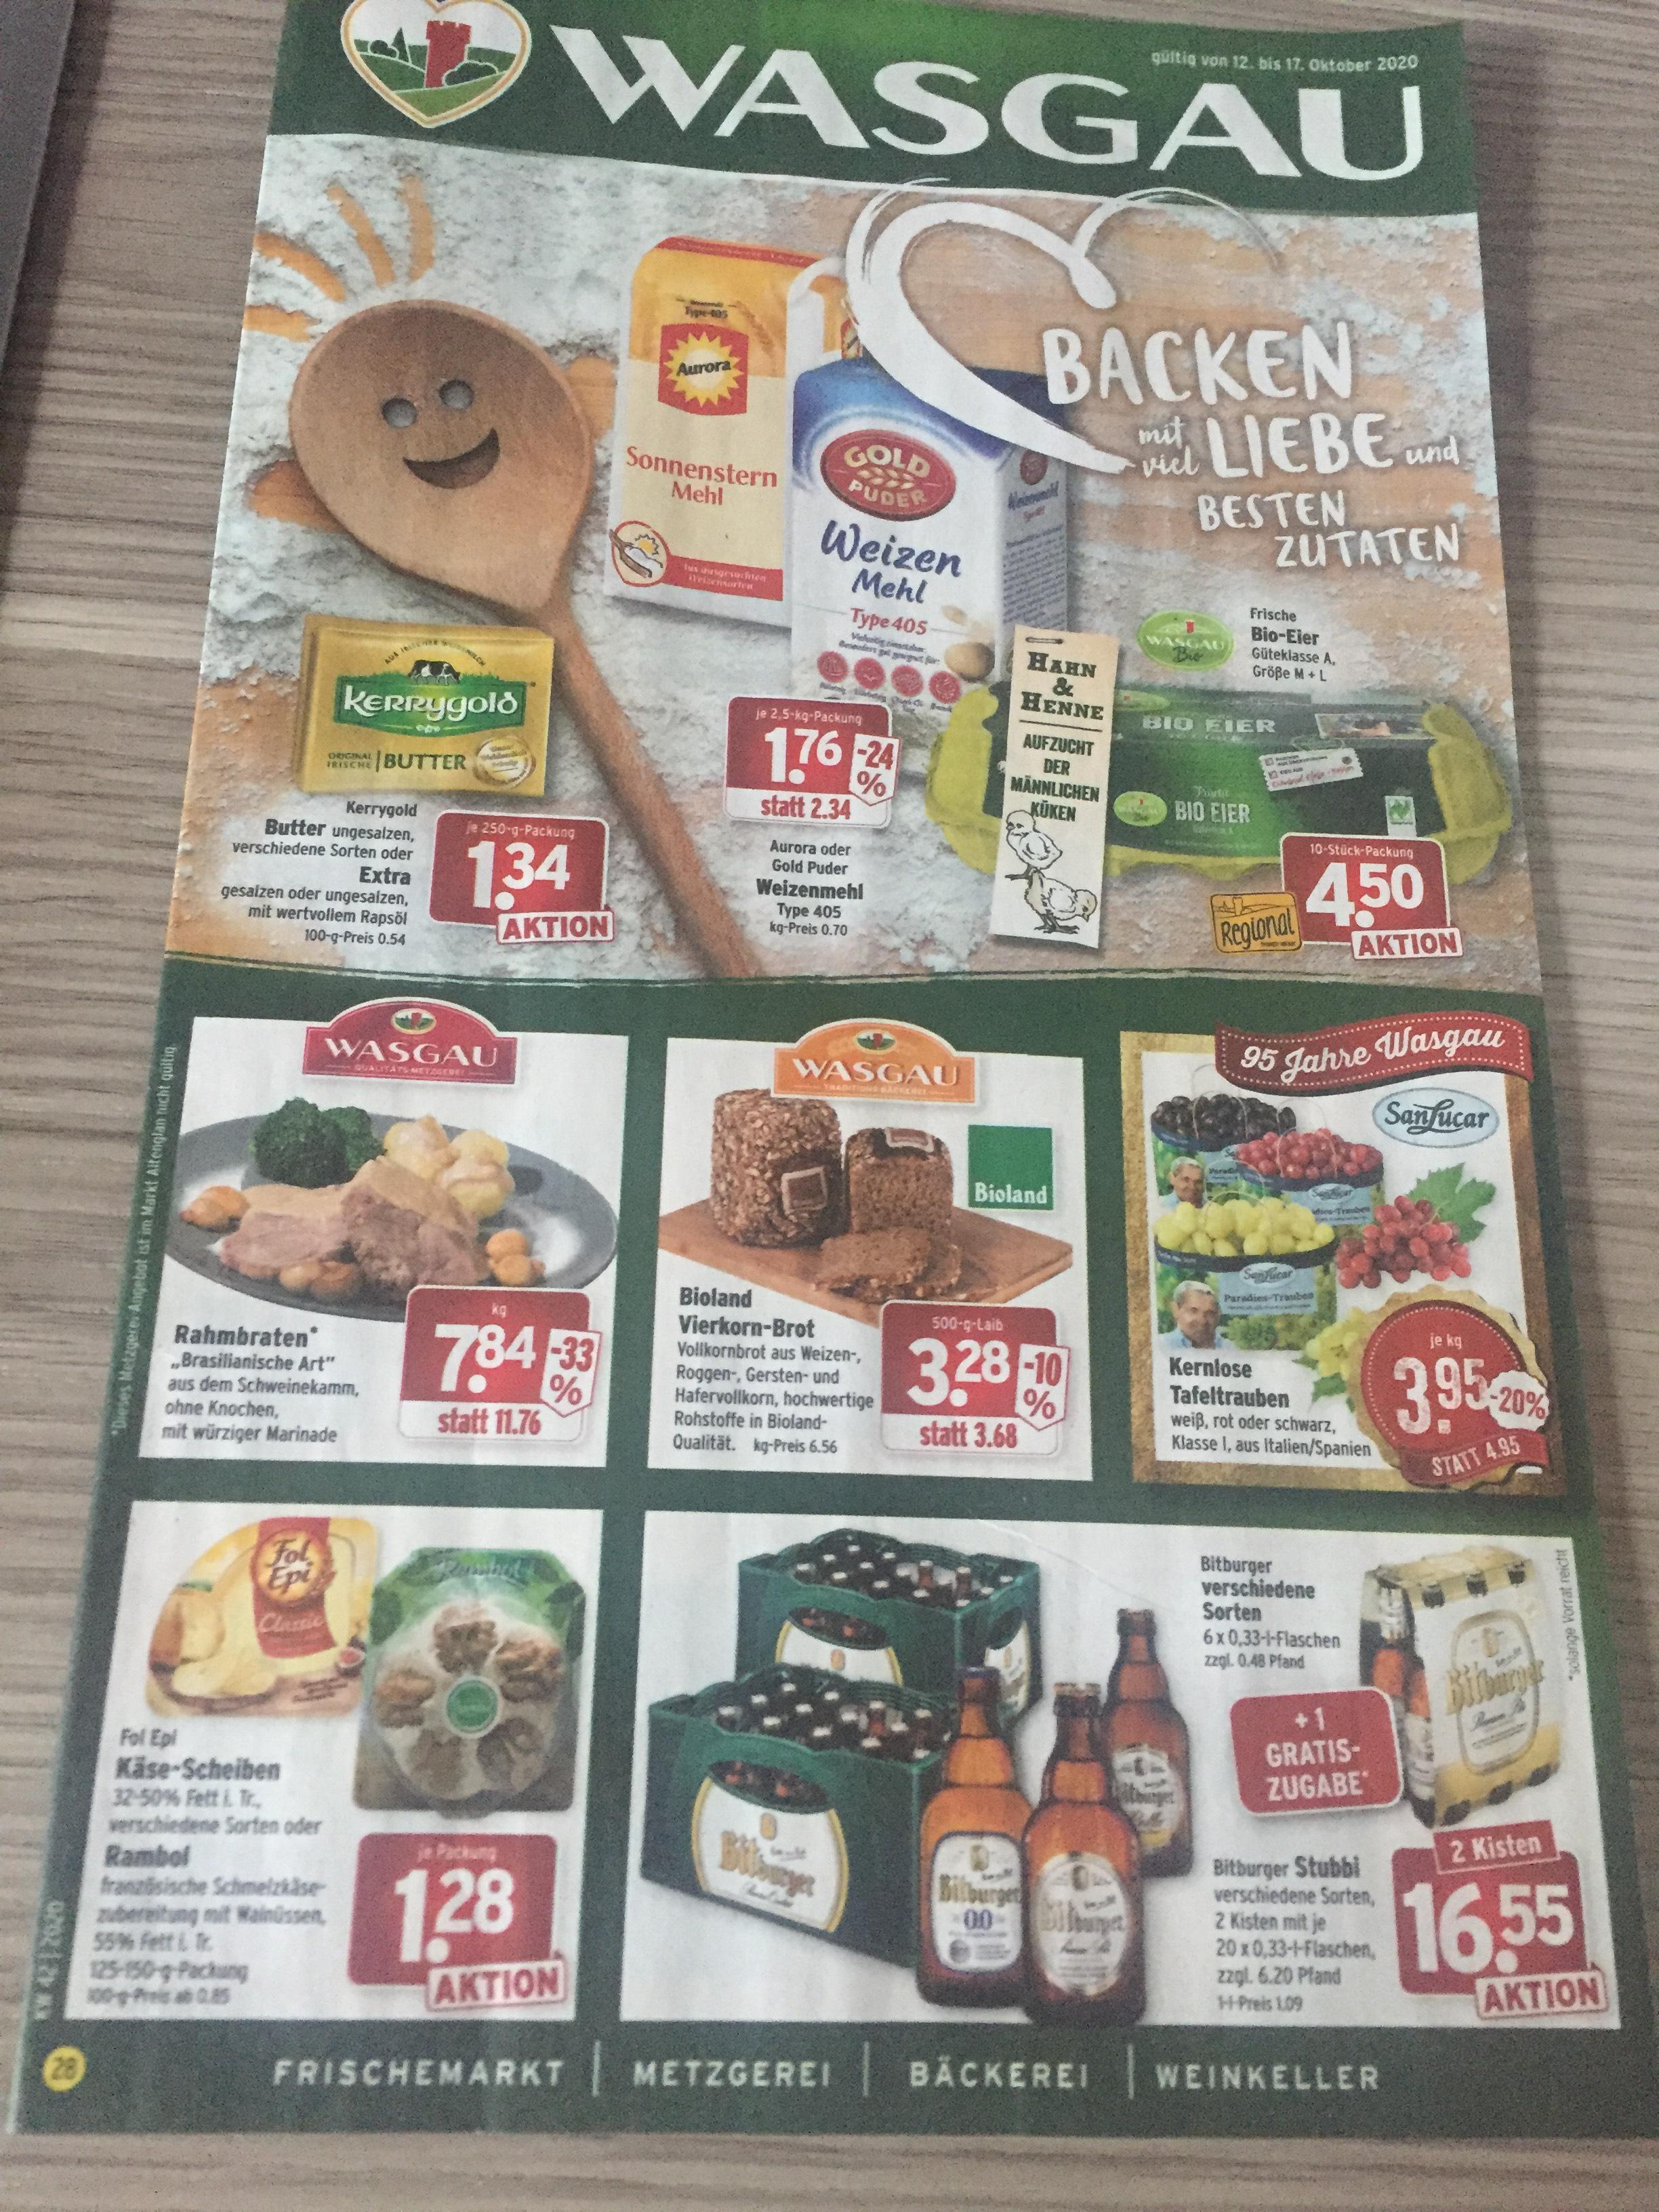 Wasgau 2 Kisten Bitburger Stubbi + Gratis 6 Pack